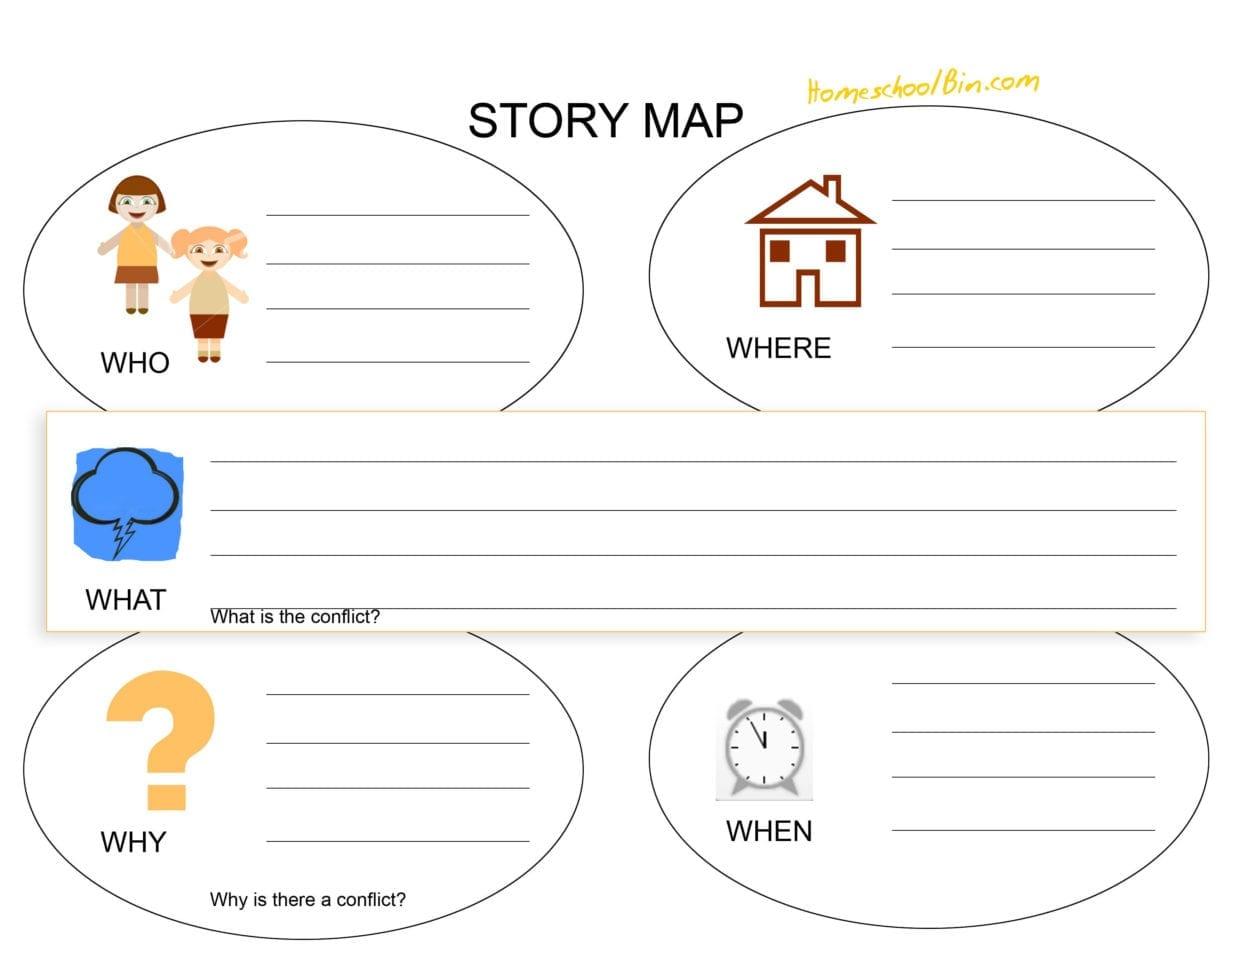 Story Map Worksheet Math Worksheets For 3rd Grade High